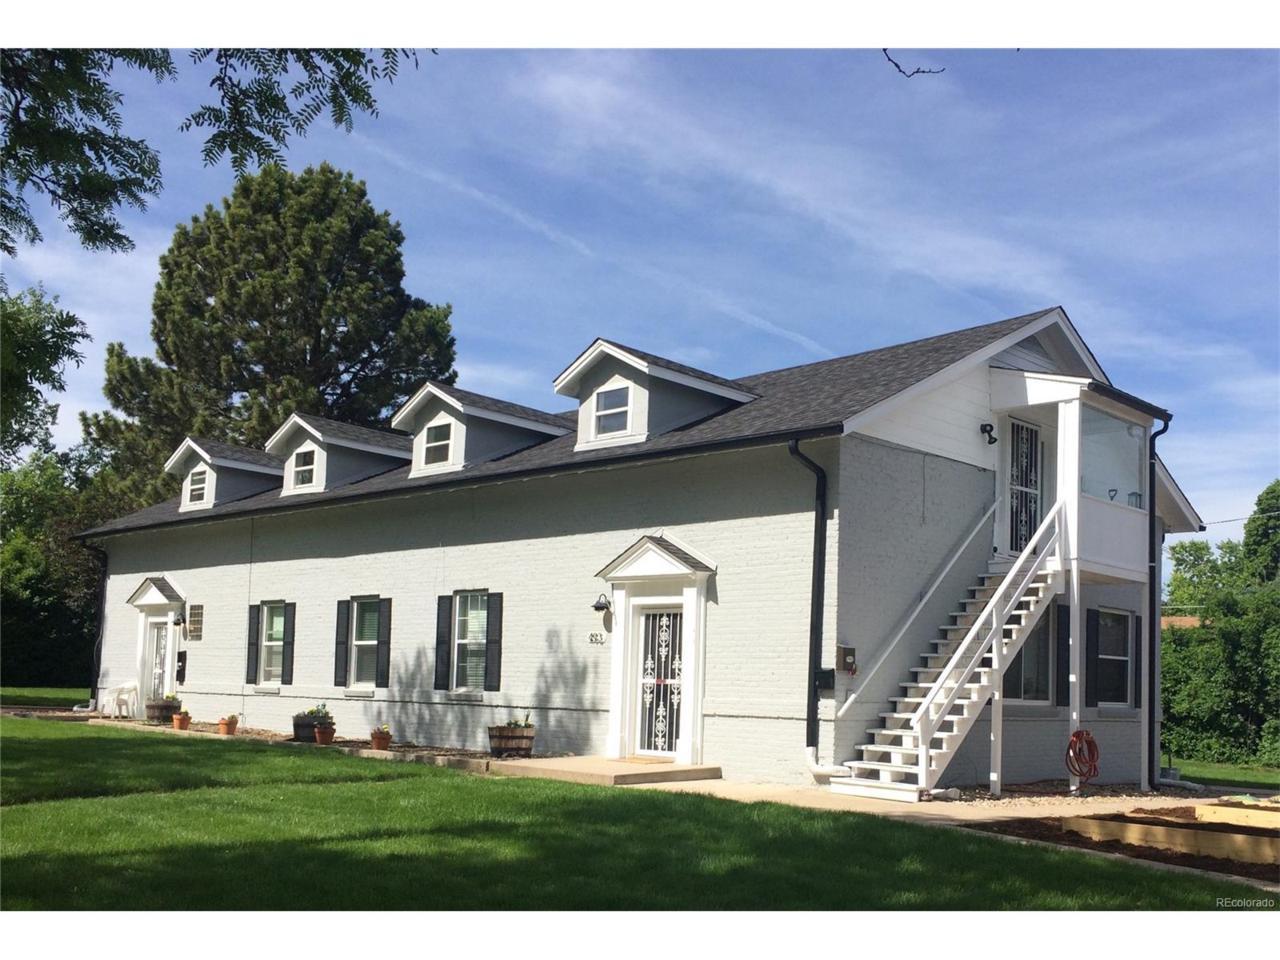 493 Fulton Street, Aurora, CO 80010 (MLS #8907678) :: 8z Real Estate